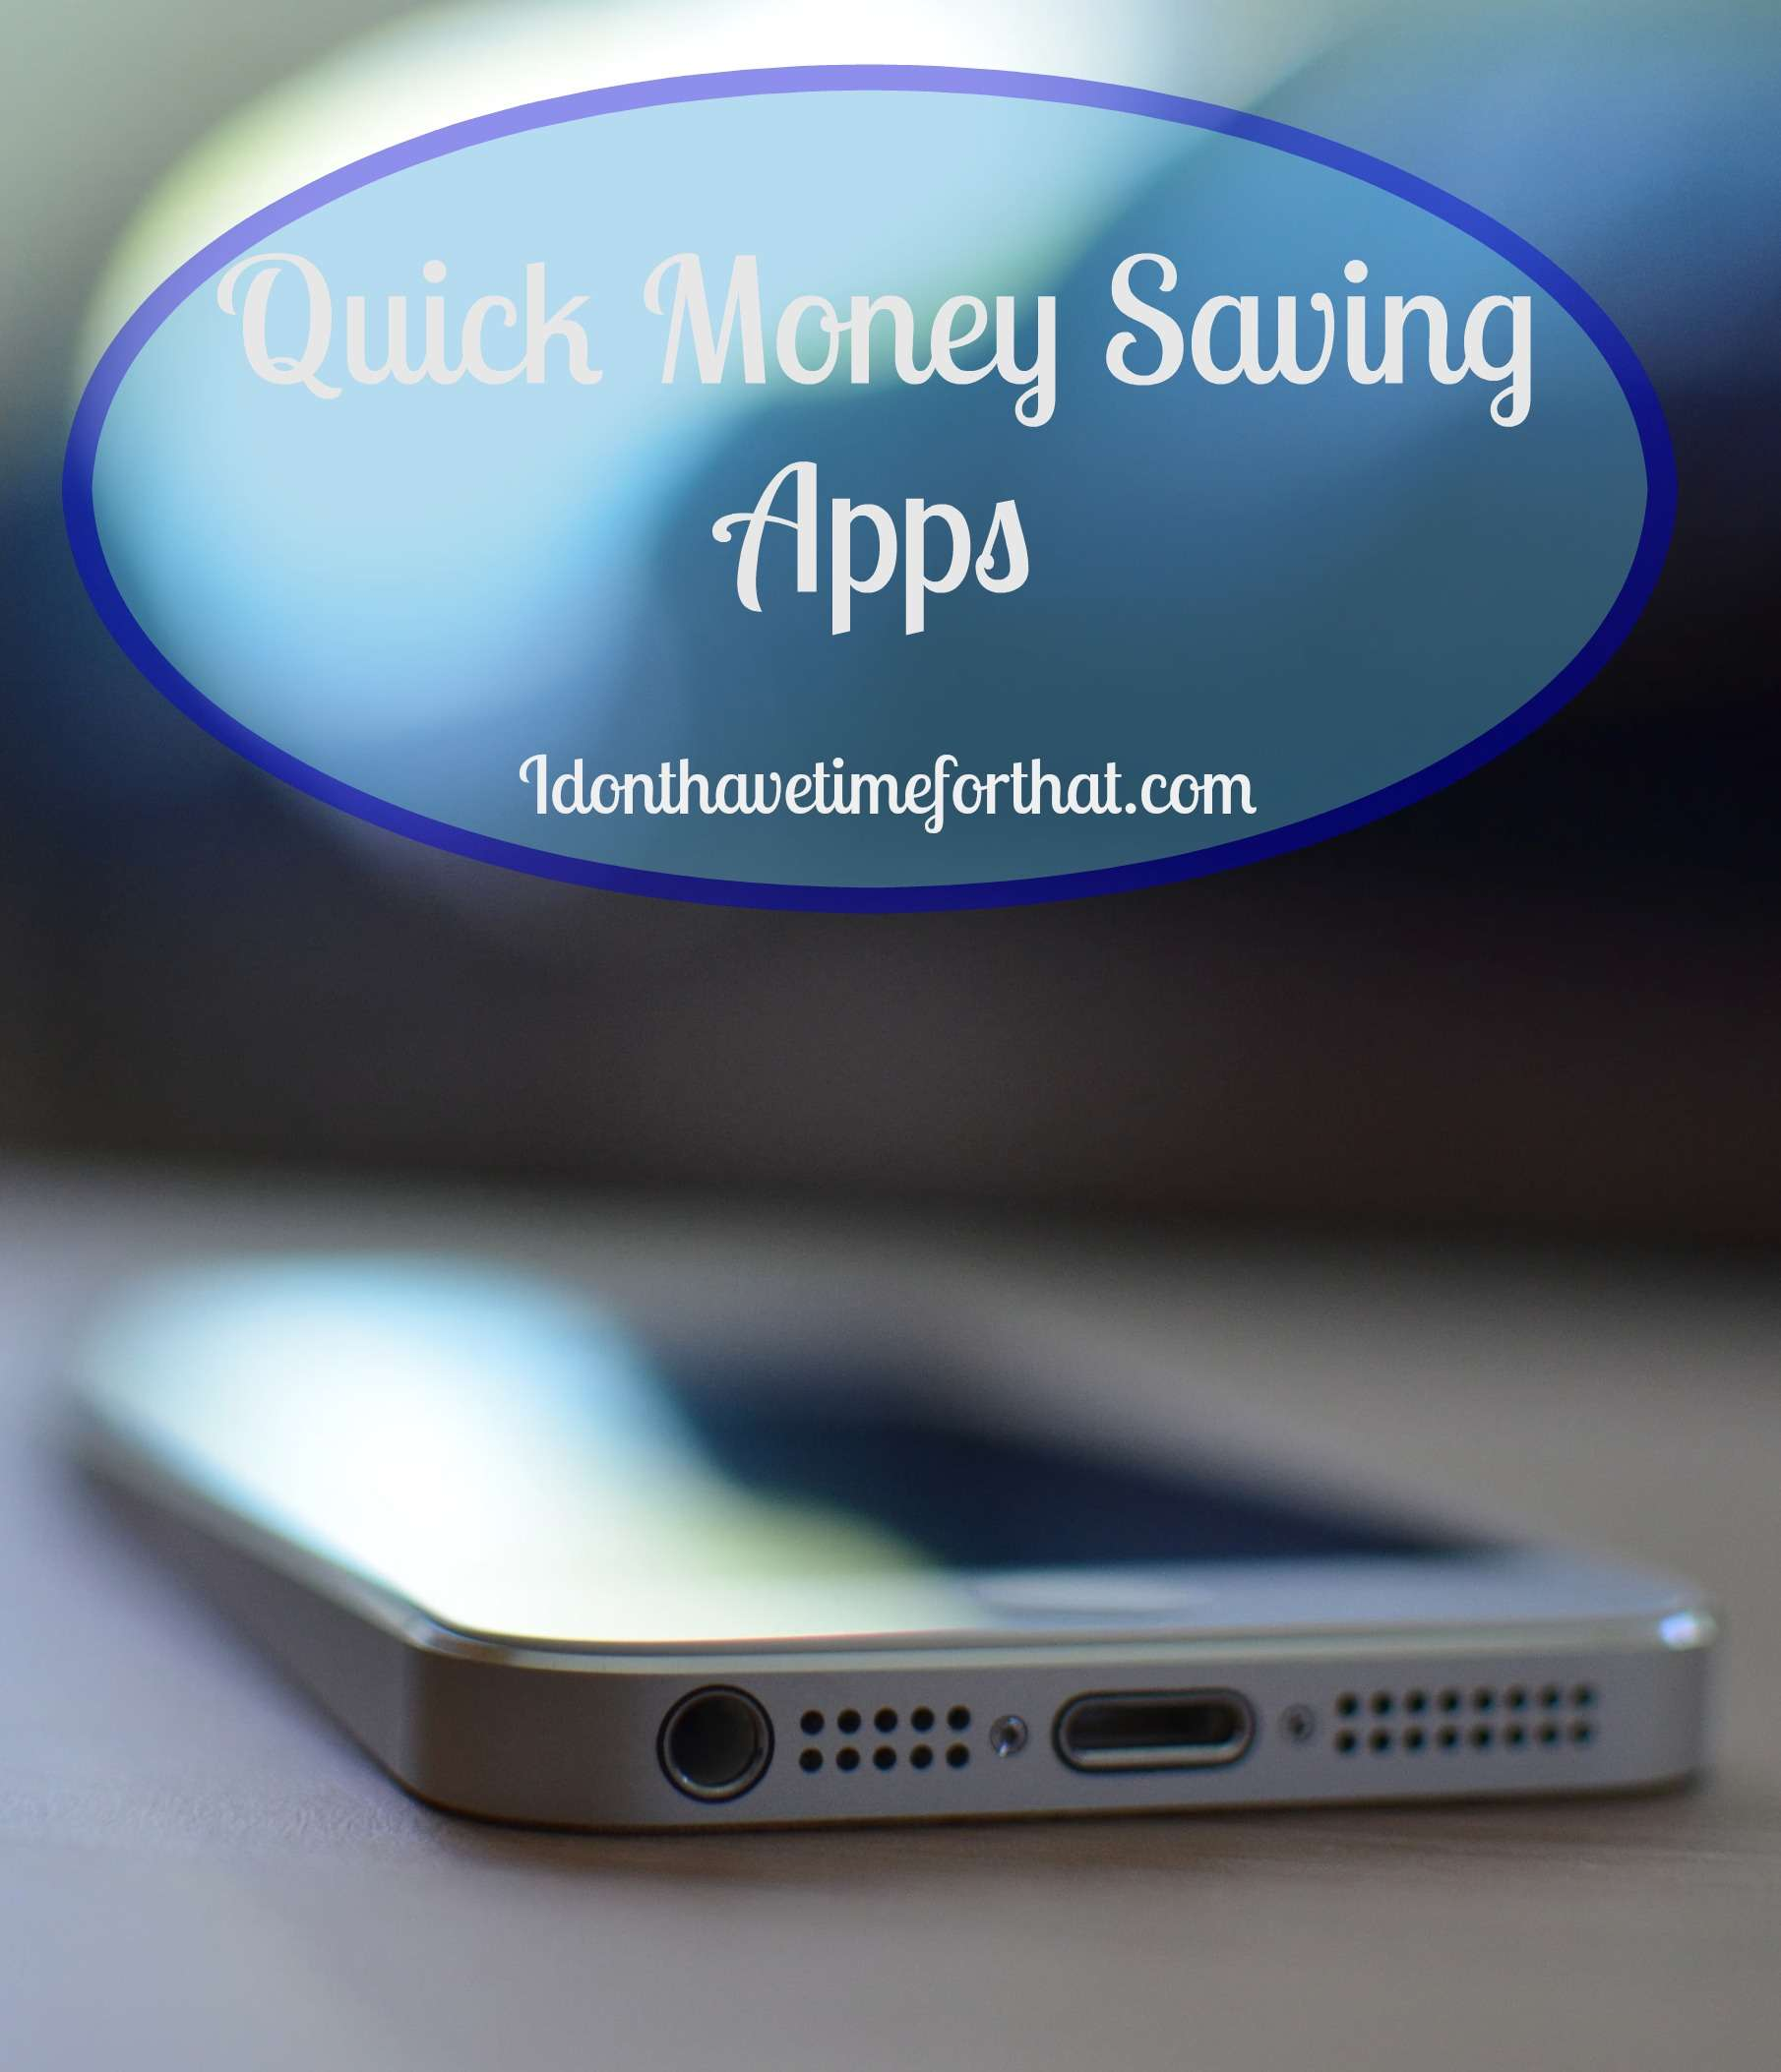 Quick Money Saving Apps